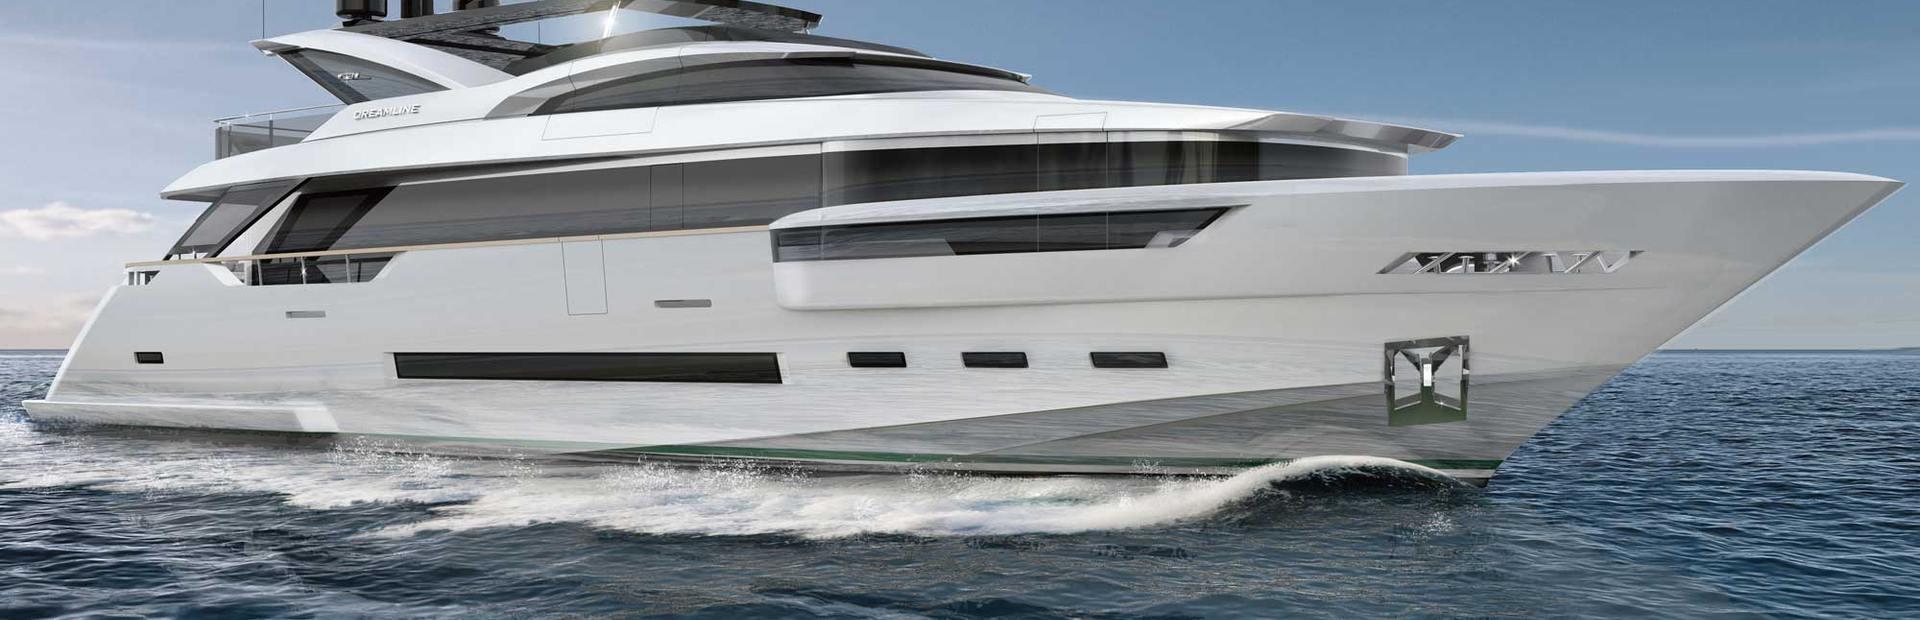 Dreamline 30 Yacht Charter